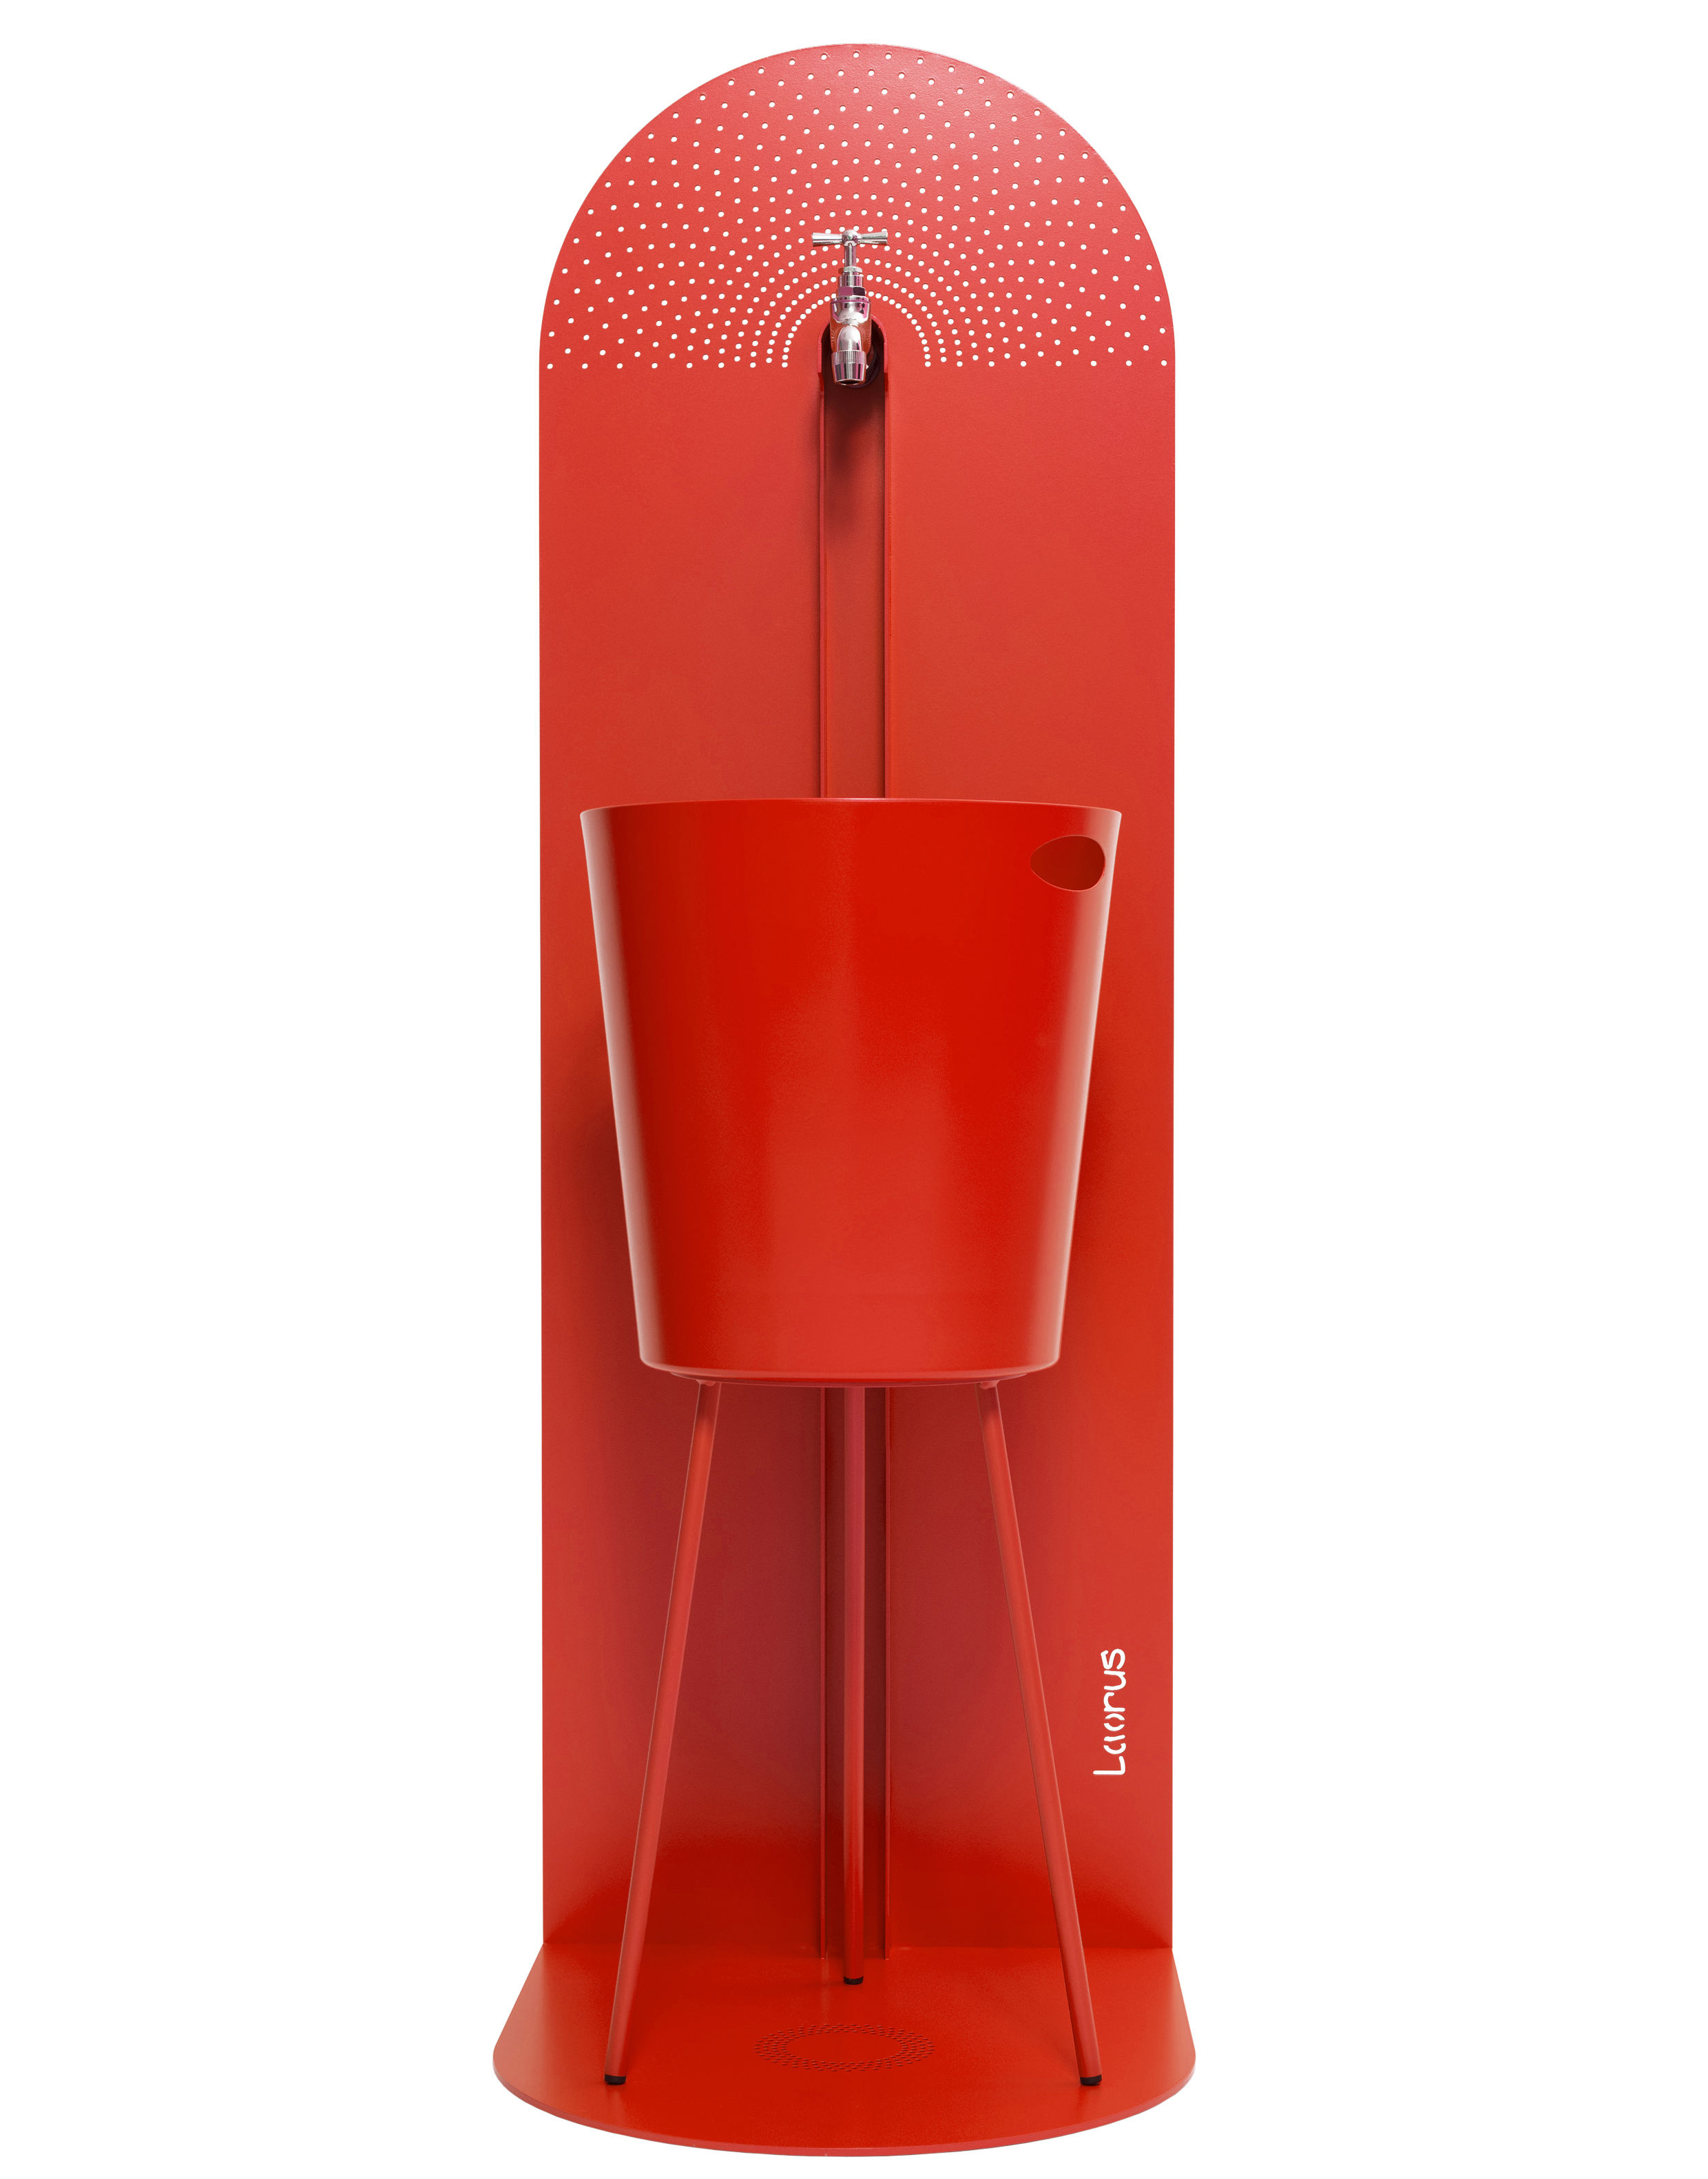 fontaine myrtifolia grand mod le h 120 cm rouge laorus. Black Bedroom Furniture Sets. Home Design Ideas